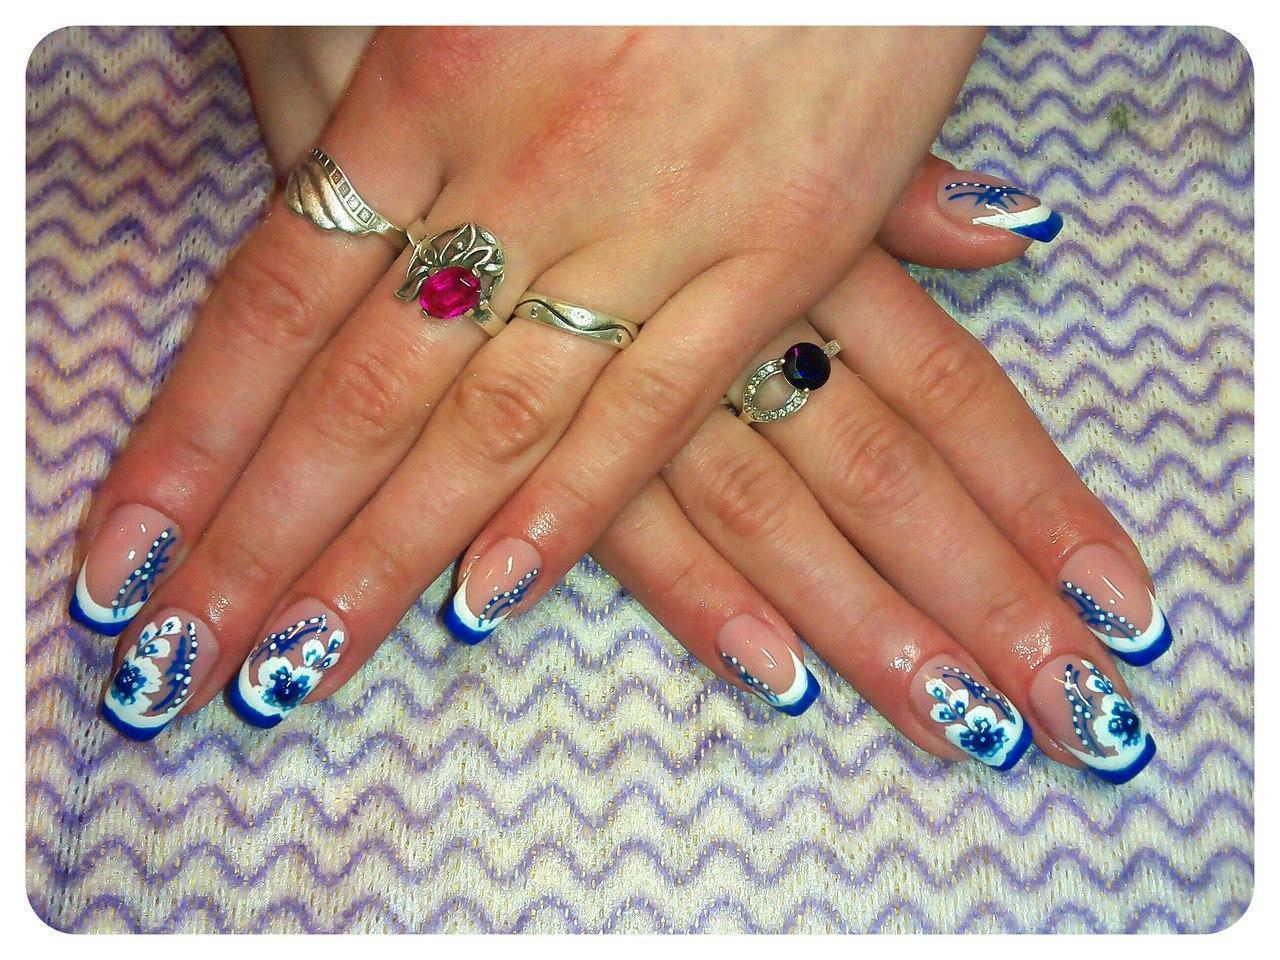 Синий с белым френч на ногтях фото